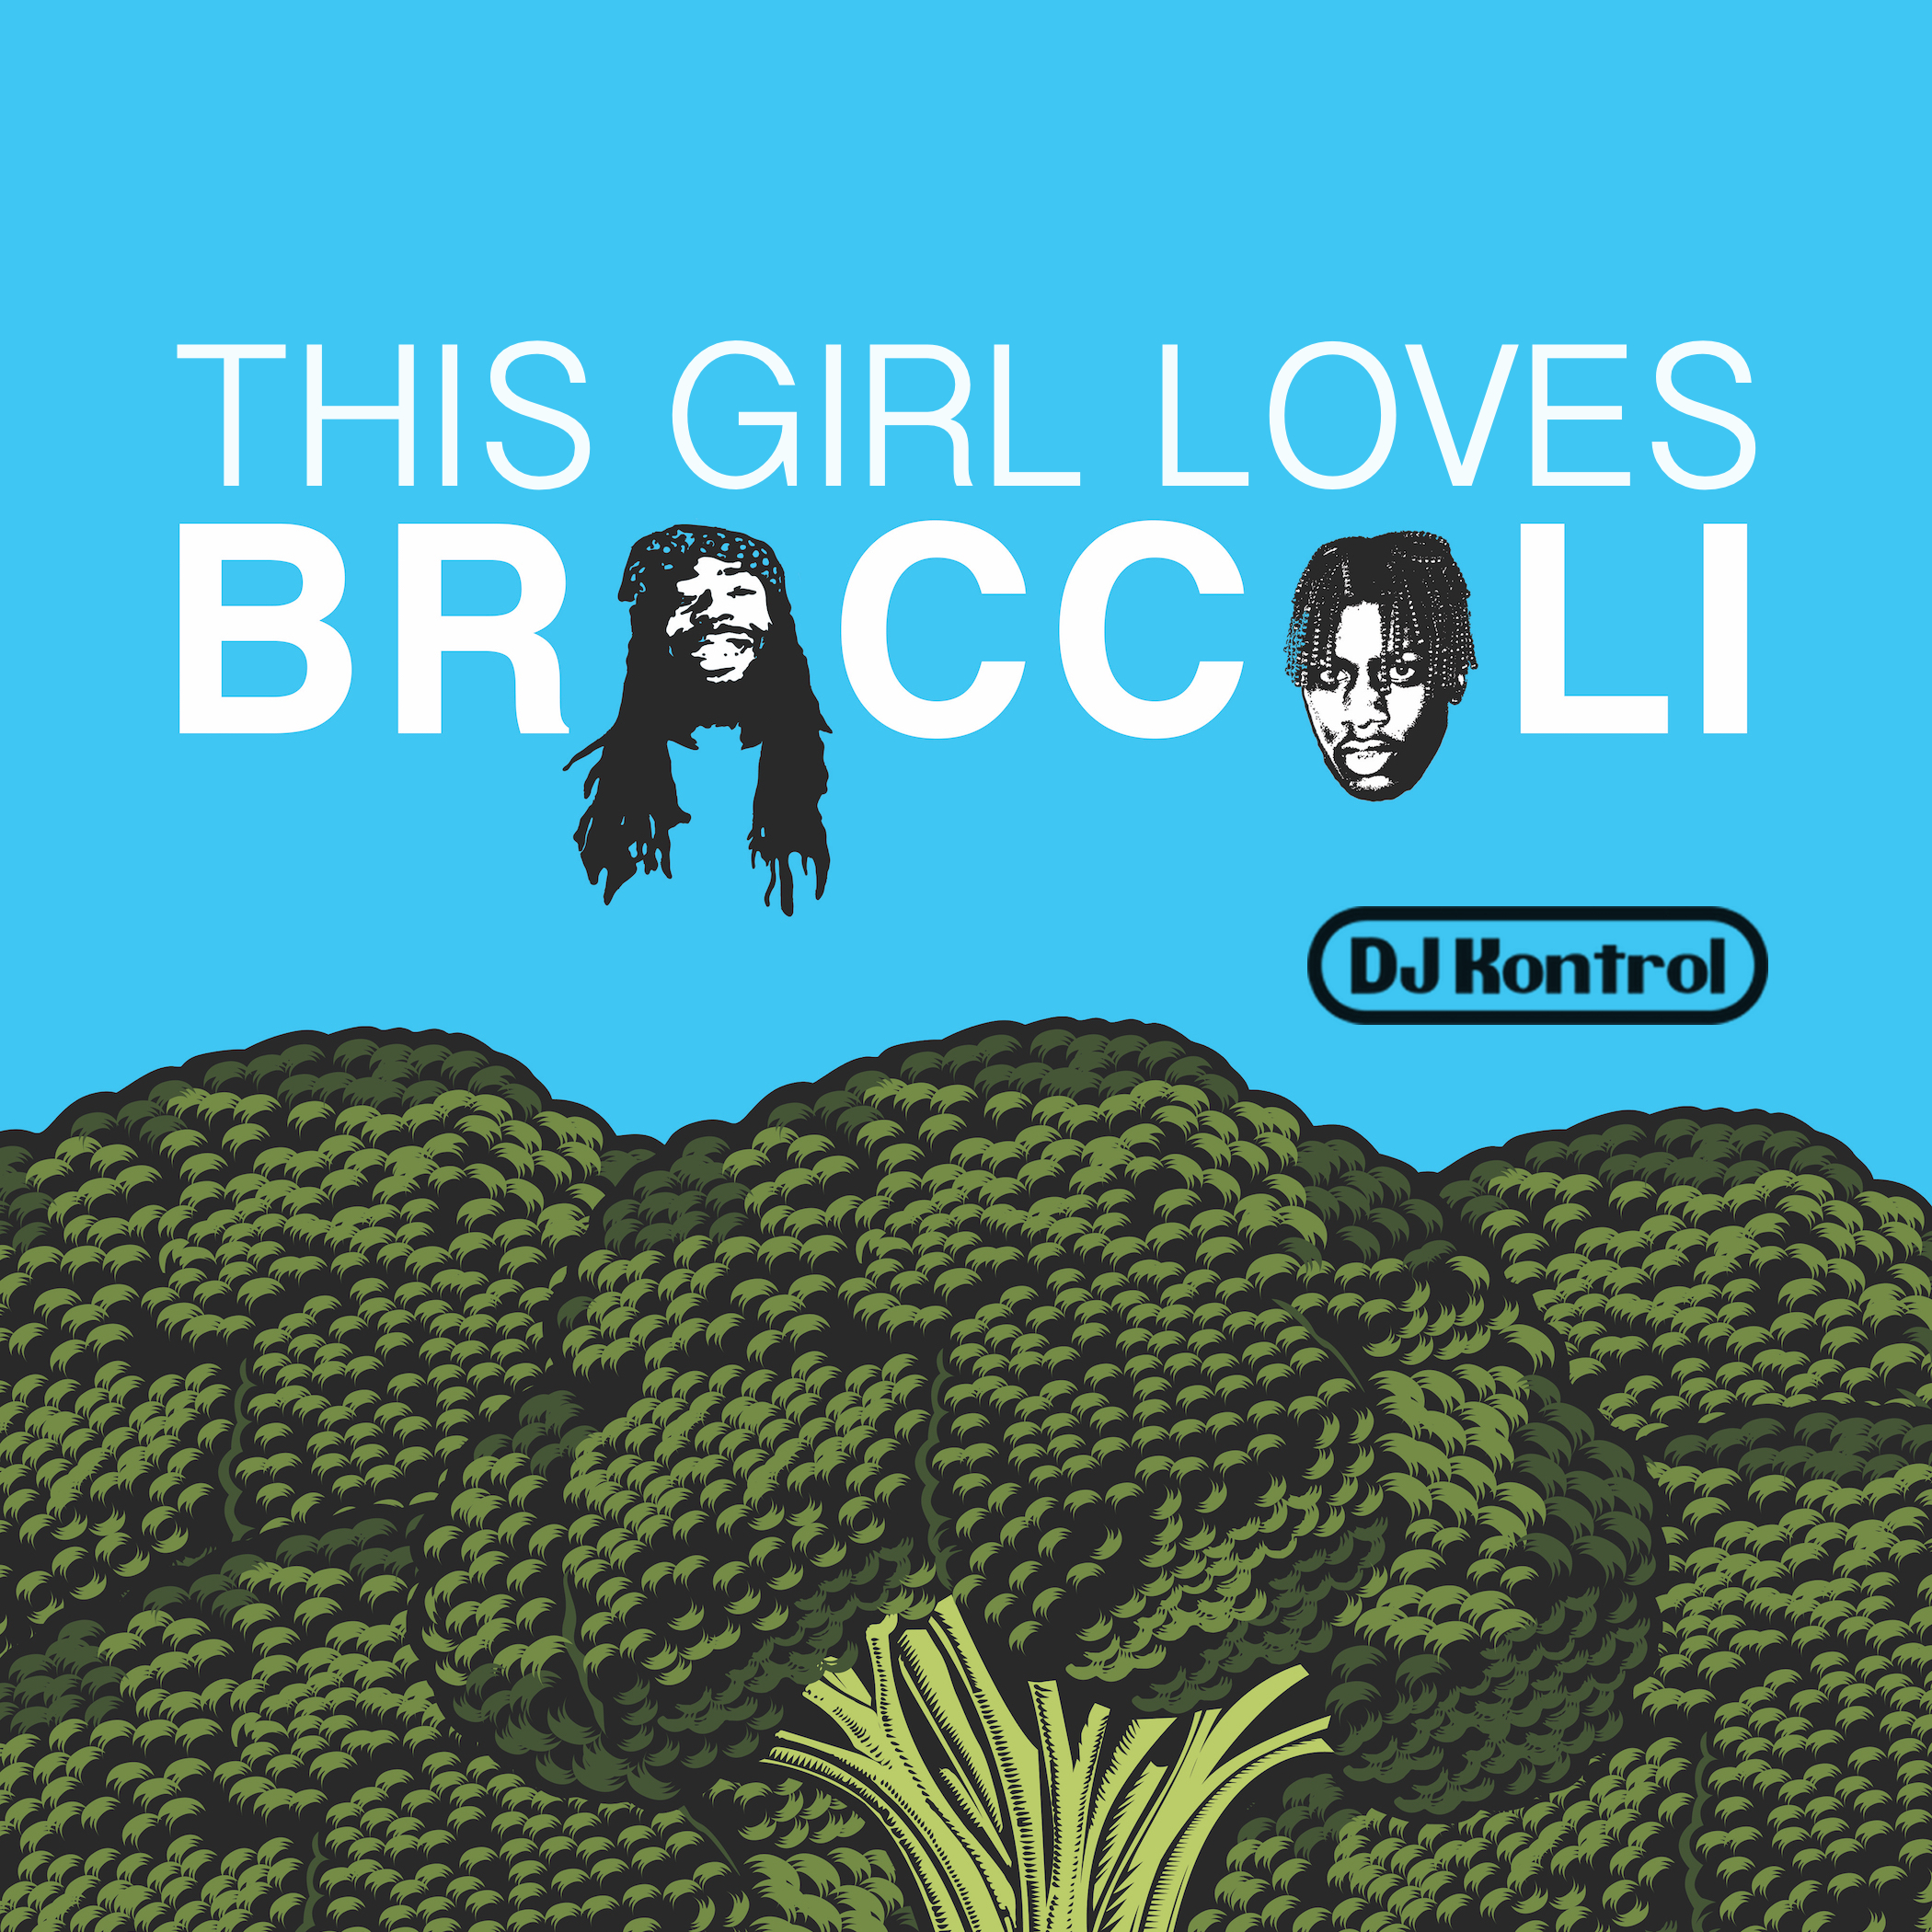 Kungs & Cookin' On 3 Burners x D.R.A.M. - This Girl Loves Broccoli (DJ Kontrol Mash)